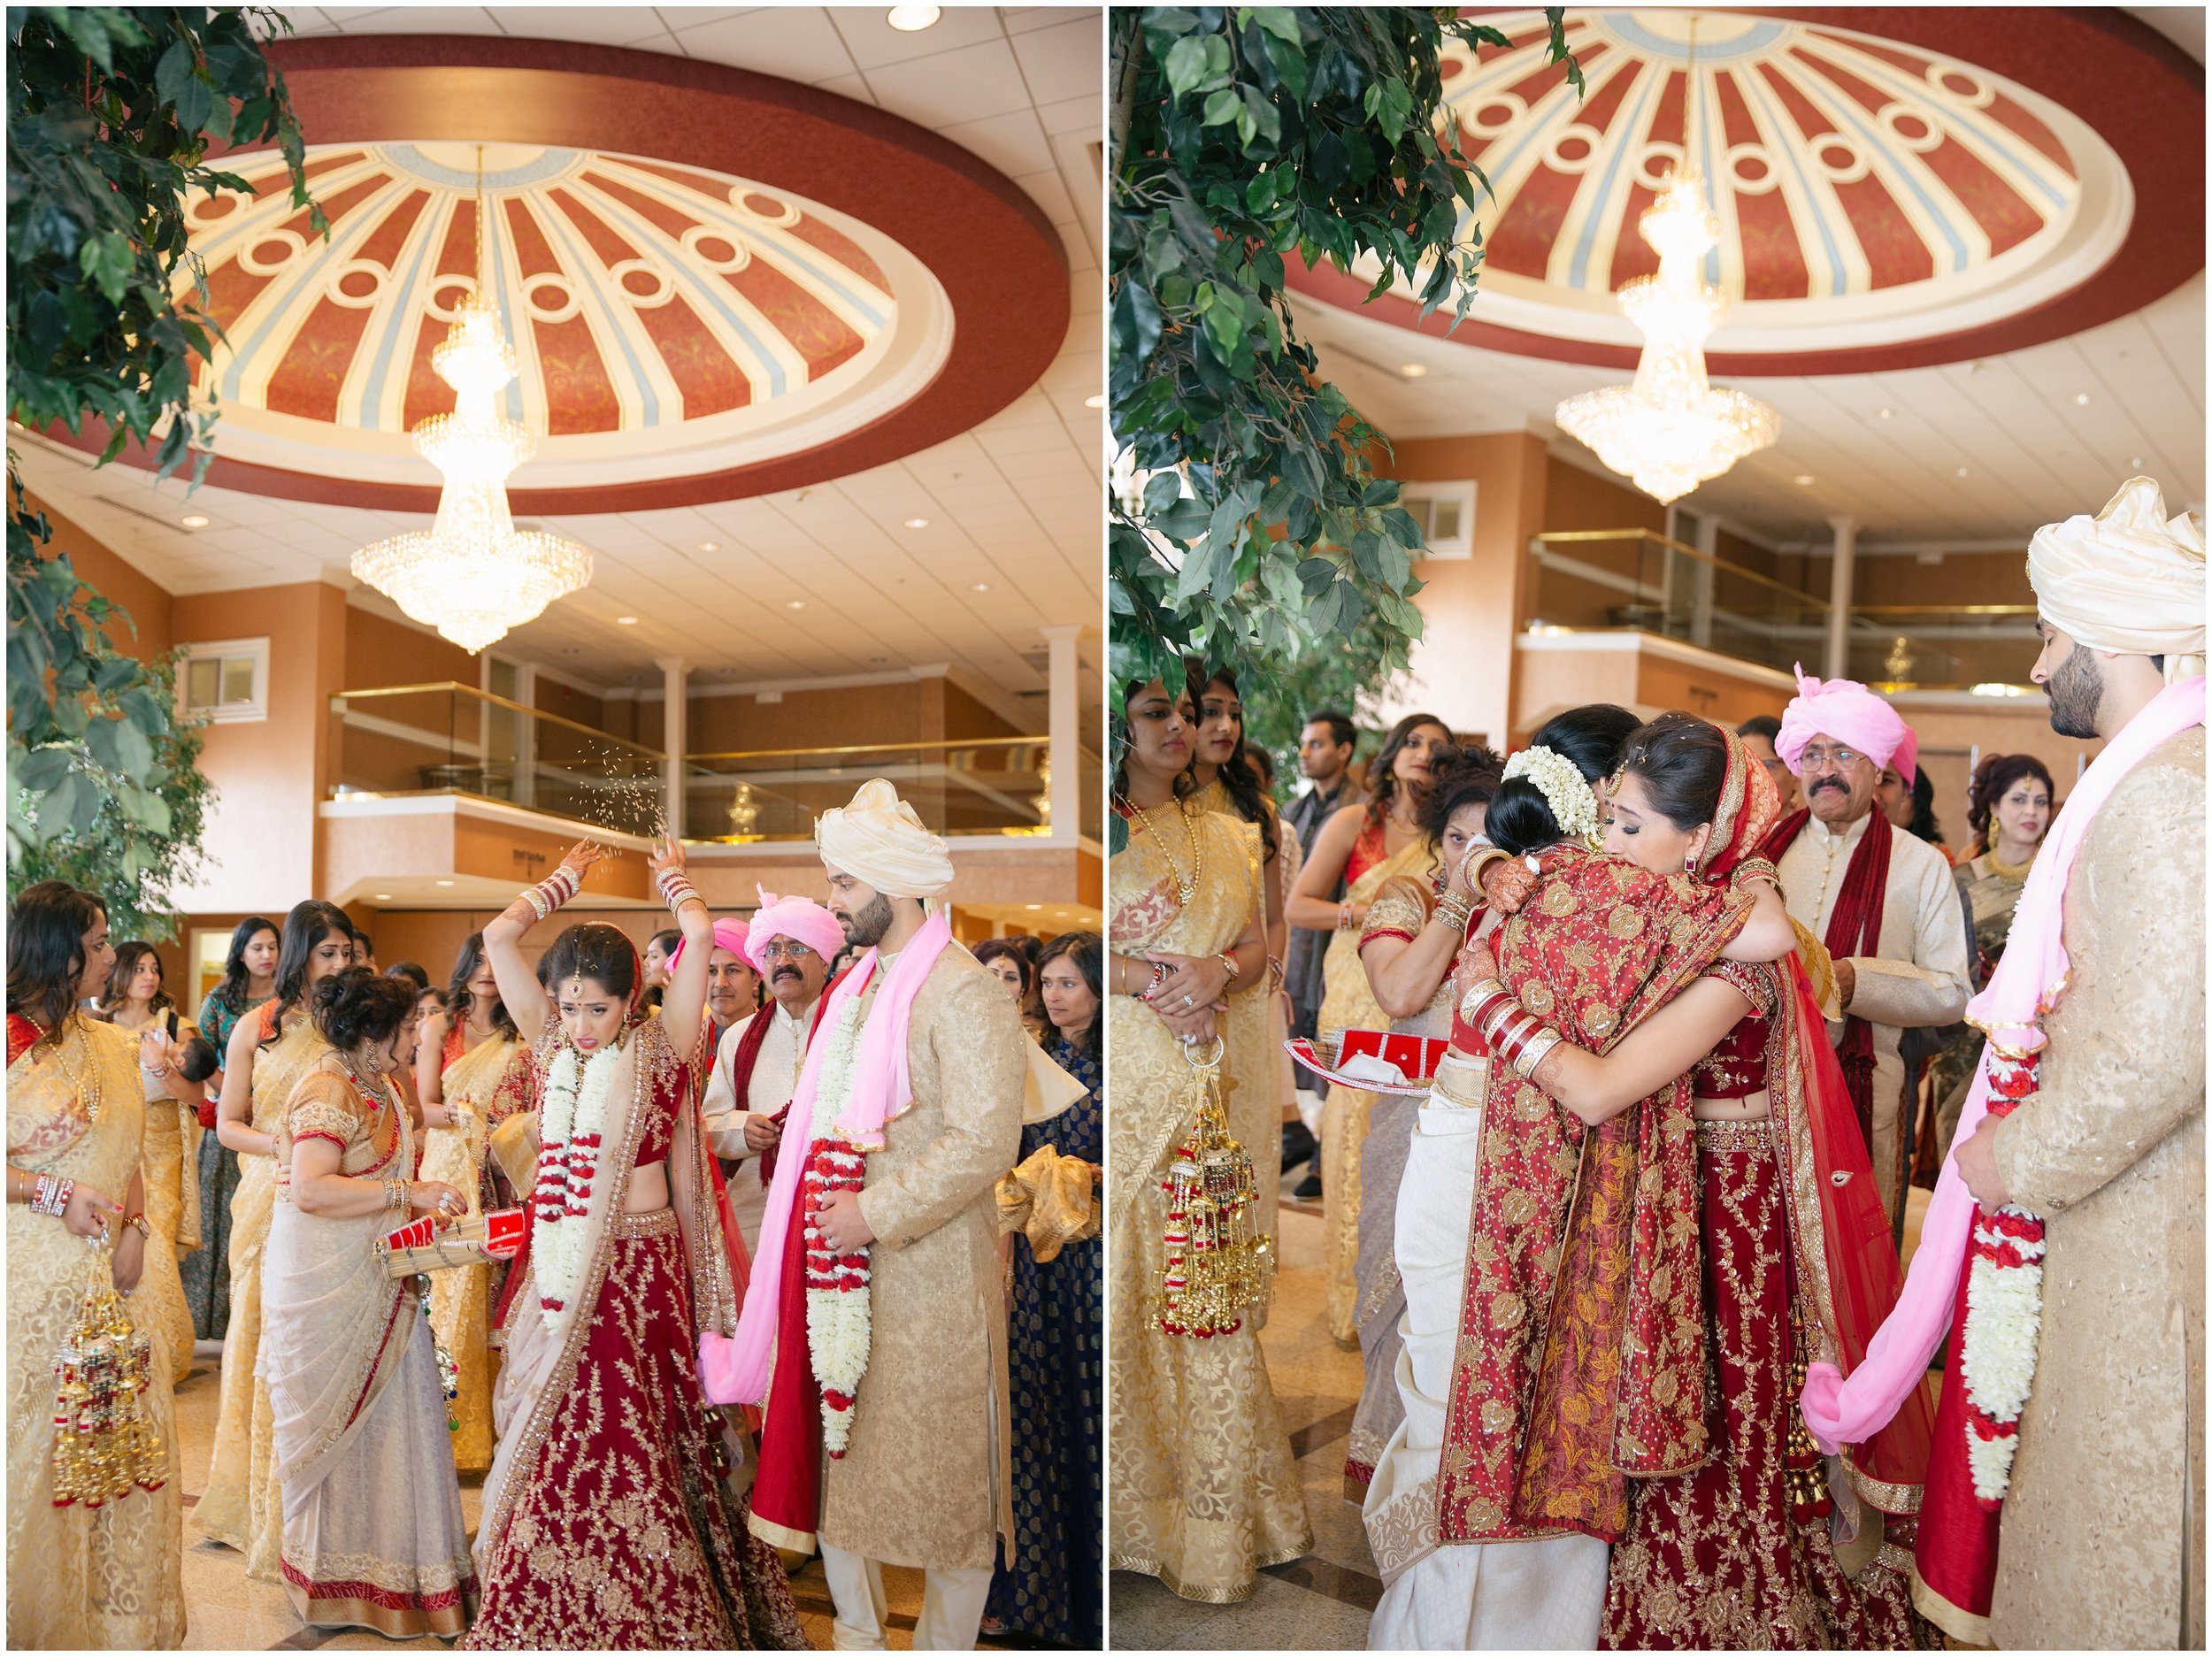 Le Cape Weddings - South Asian Wedding in Illinois - Tanvi and Anshul -9884_LuxuryDestinationPhotographer.jpg